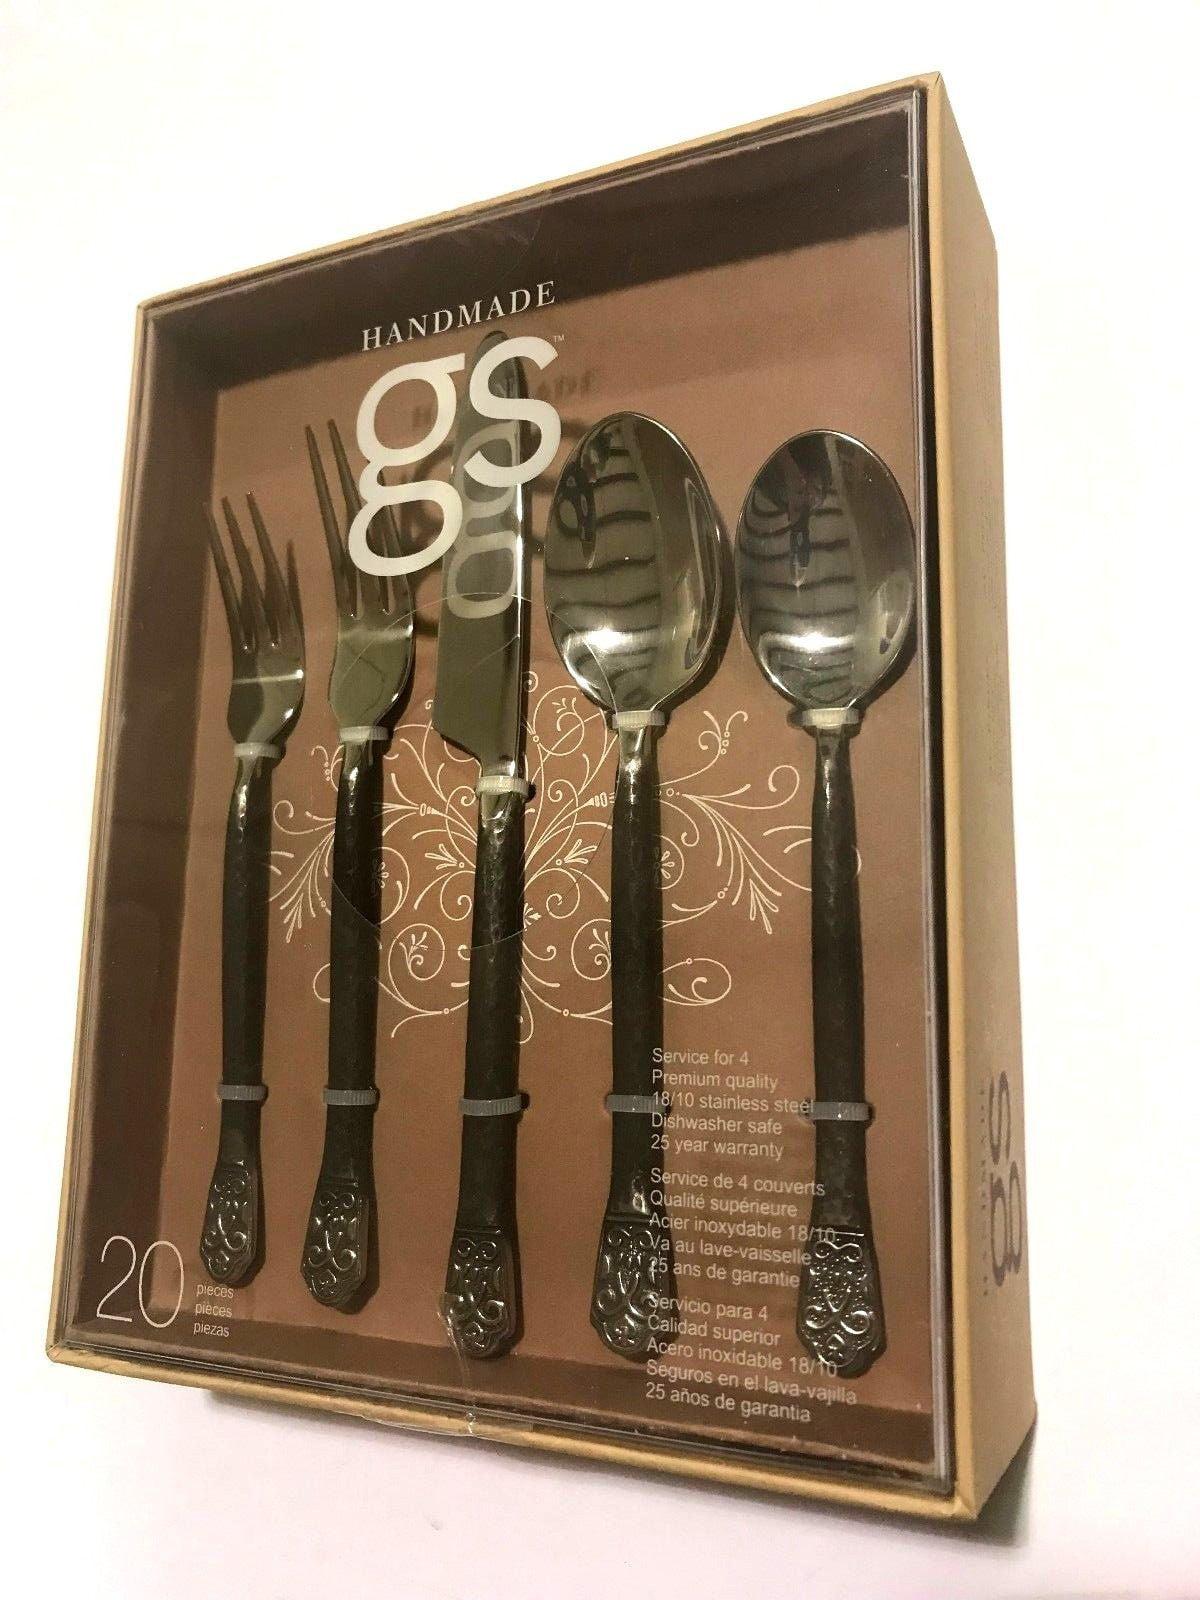 Service for 4 Gourmet Settings Avalon 20-Piece Flatware Set